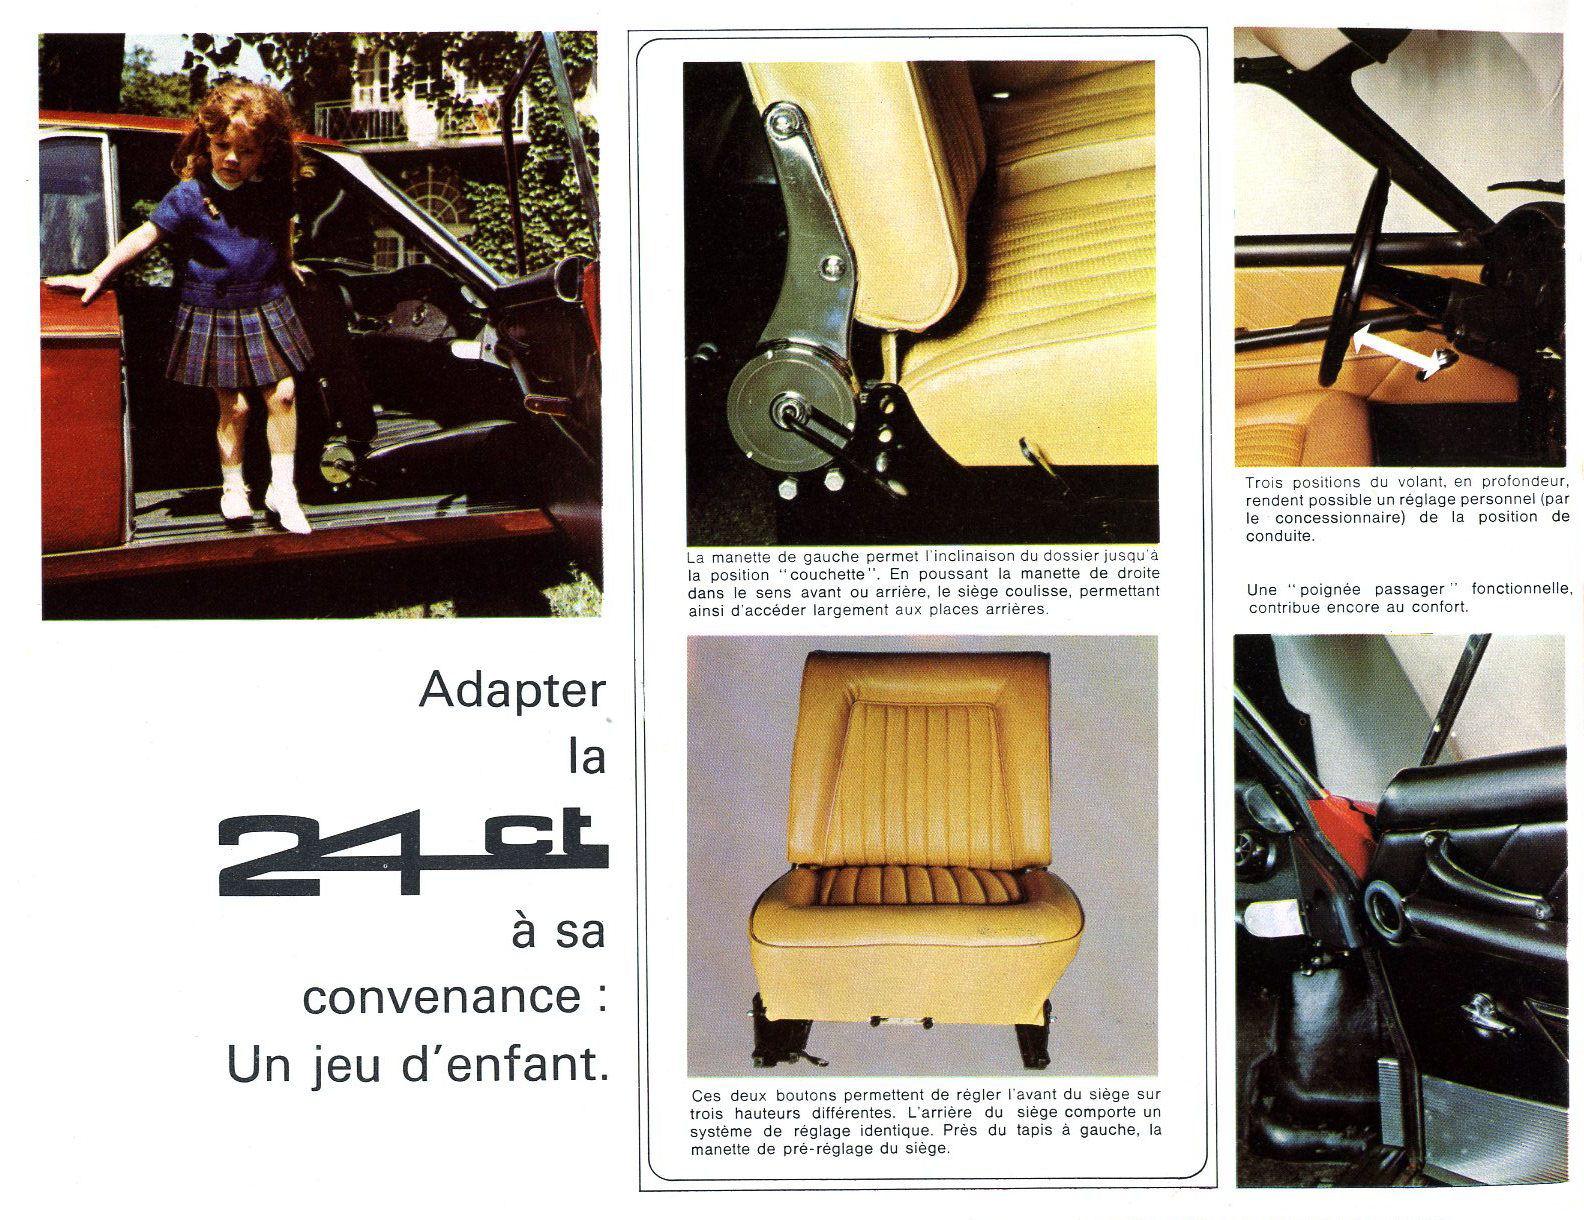 1963 Panhard 24 CT brochure